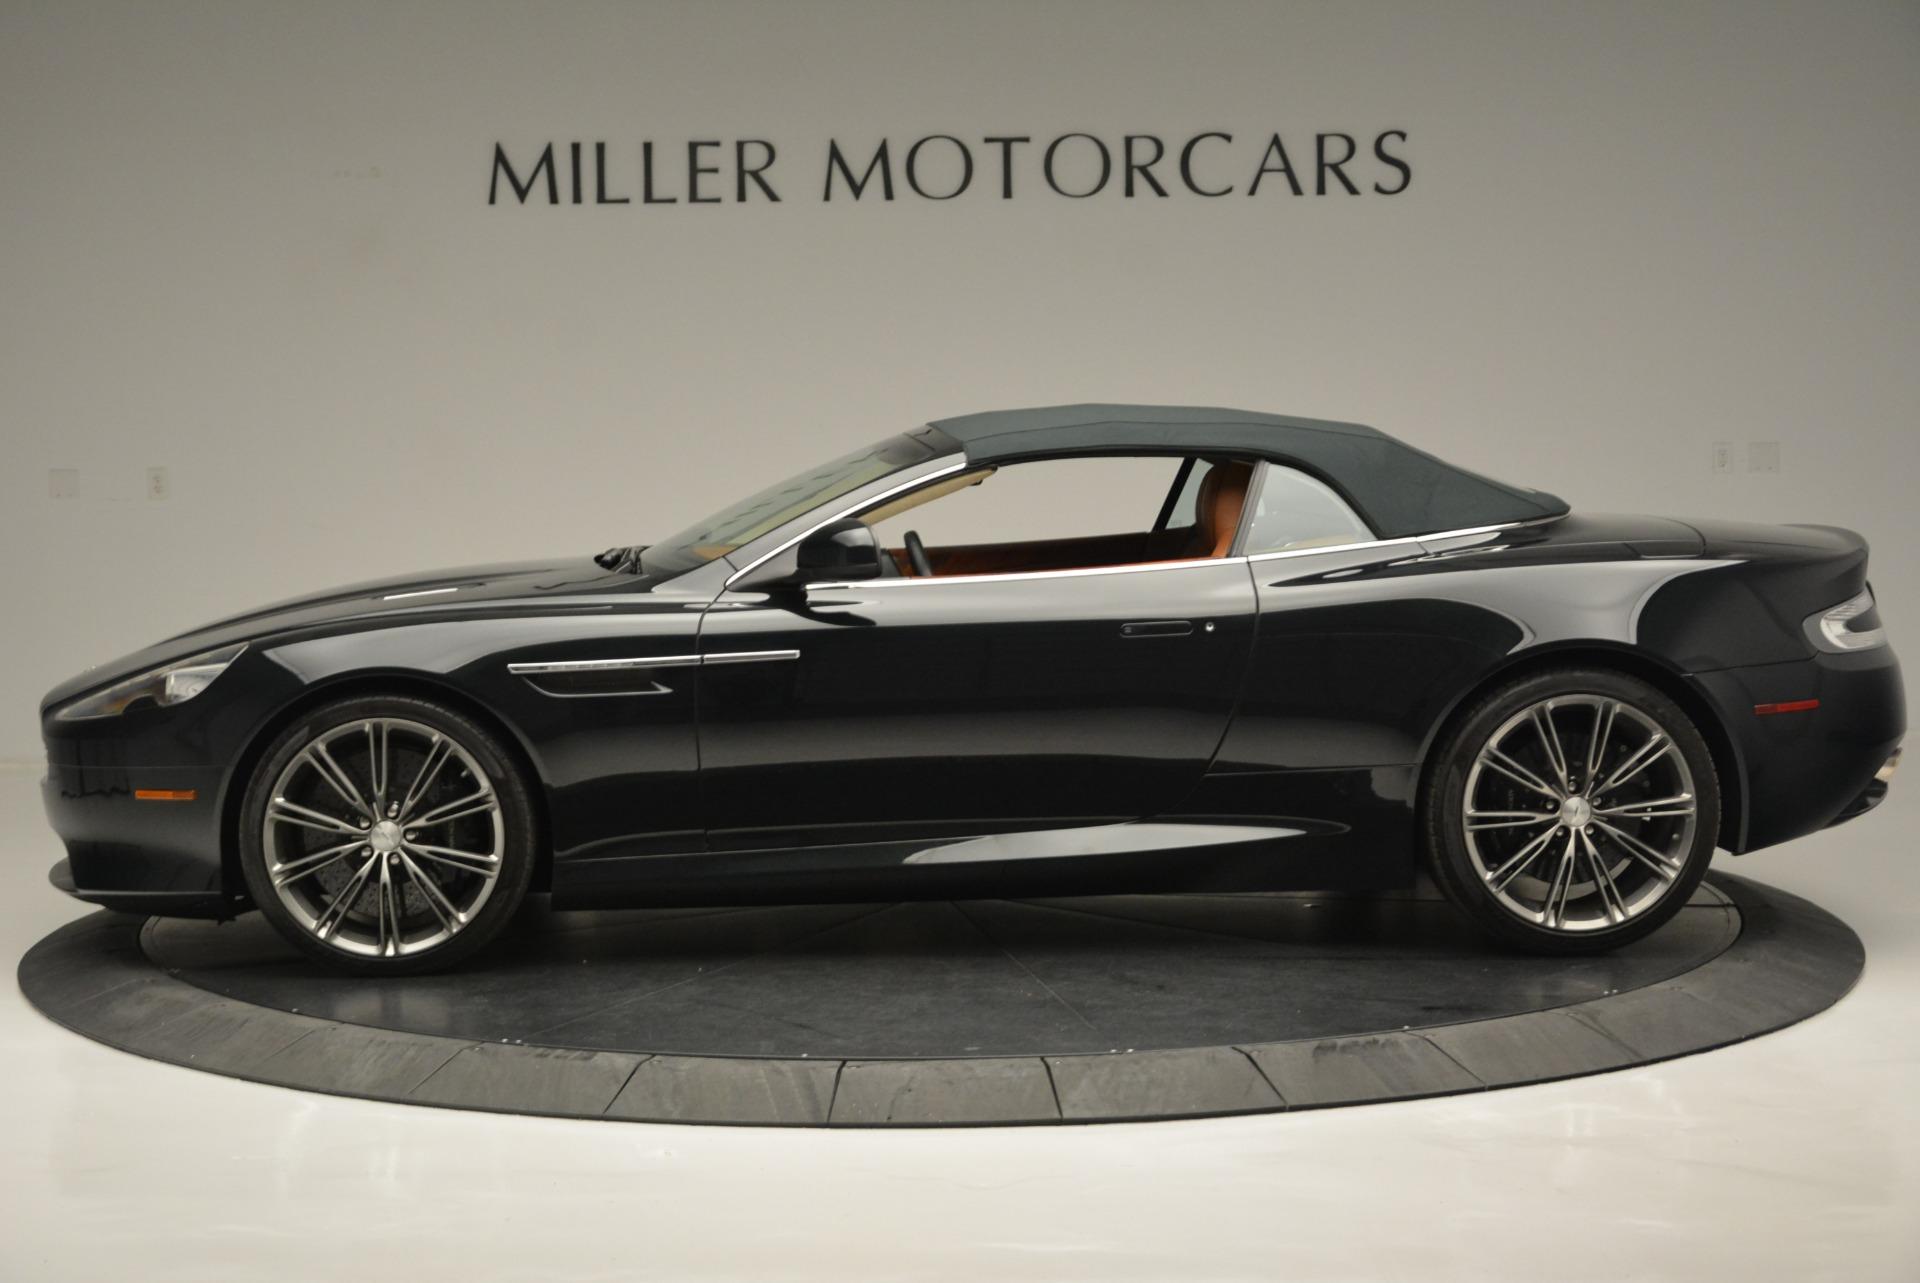 Used 2012 Aston Martin Virage Volante For Sale In Westport, CT 2508_p15